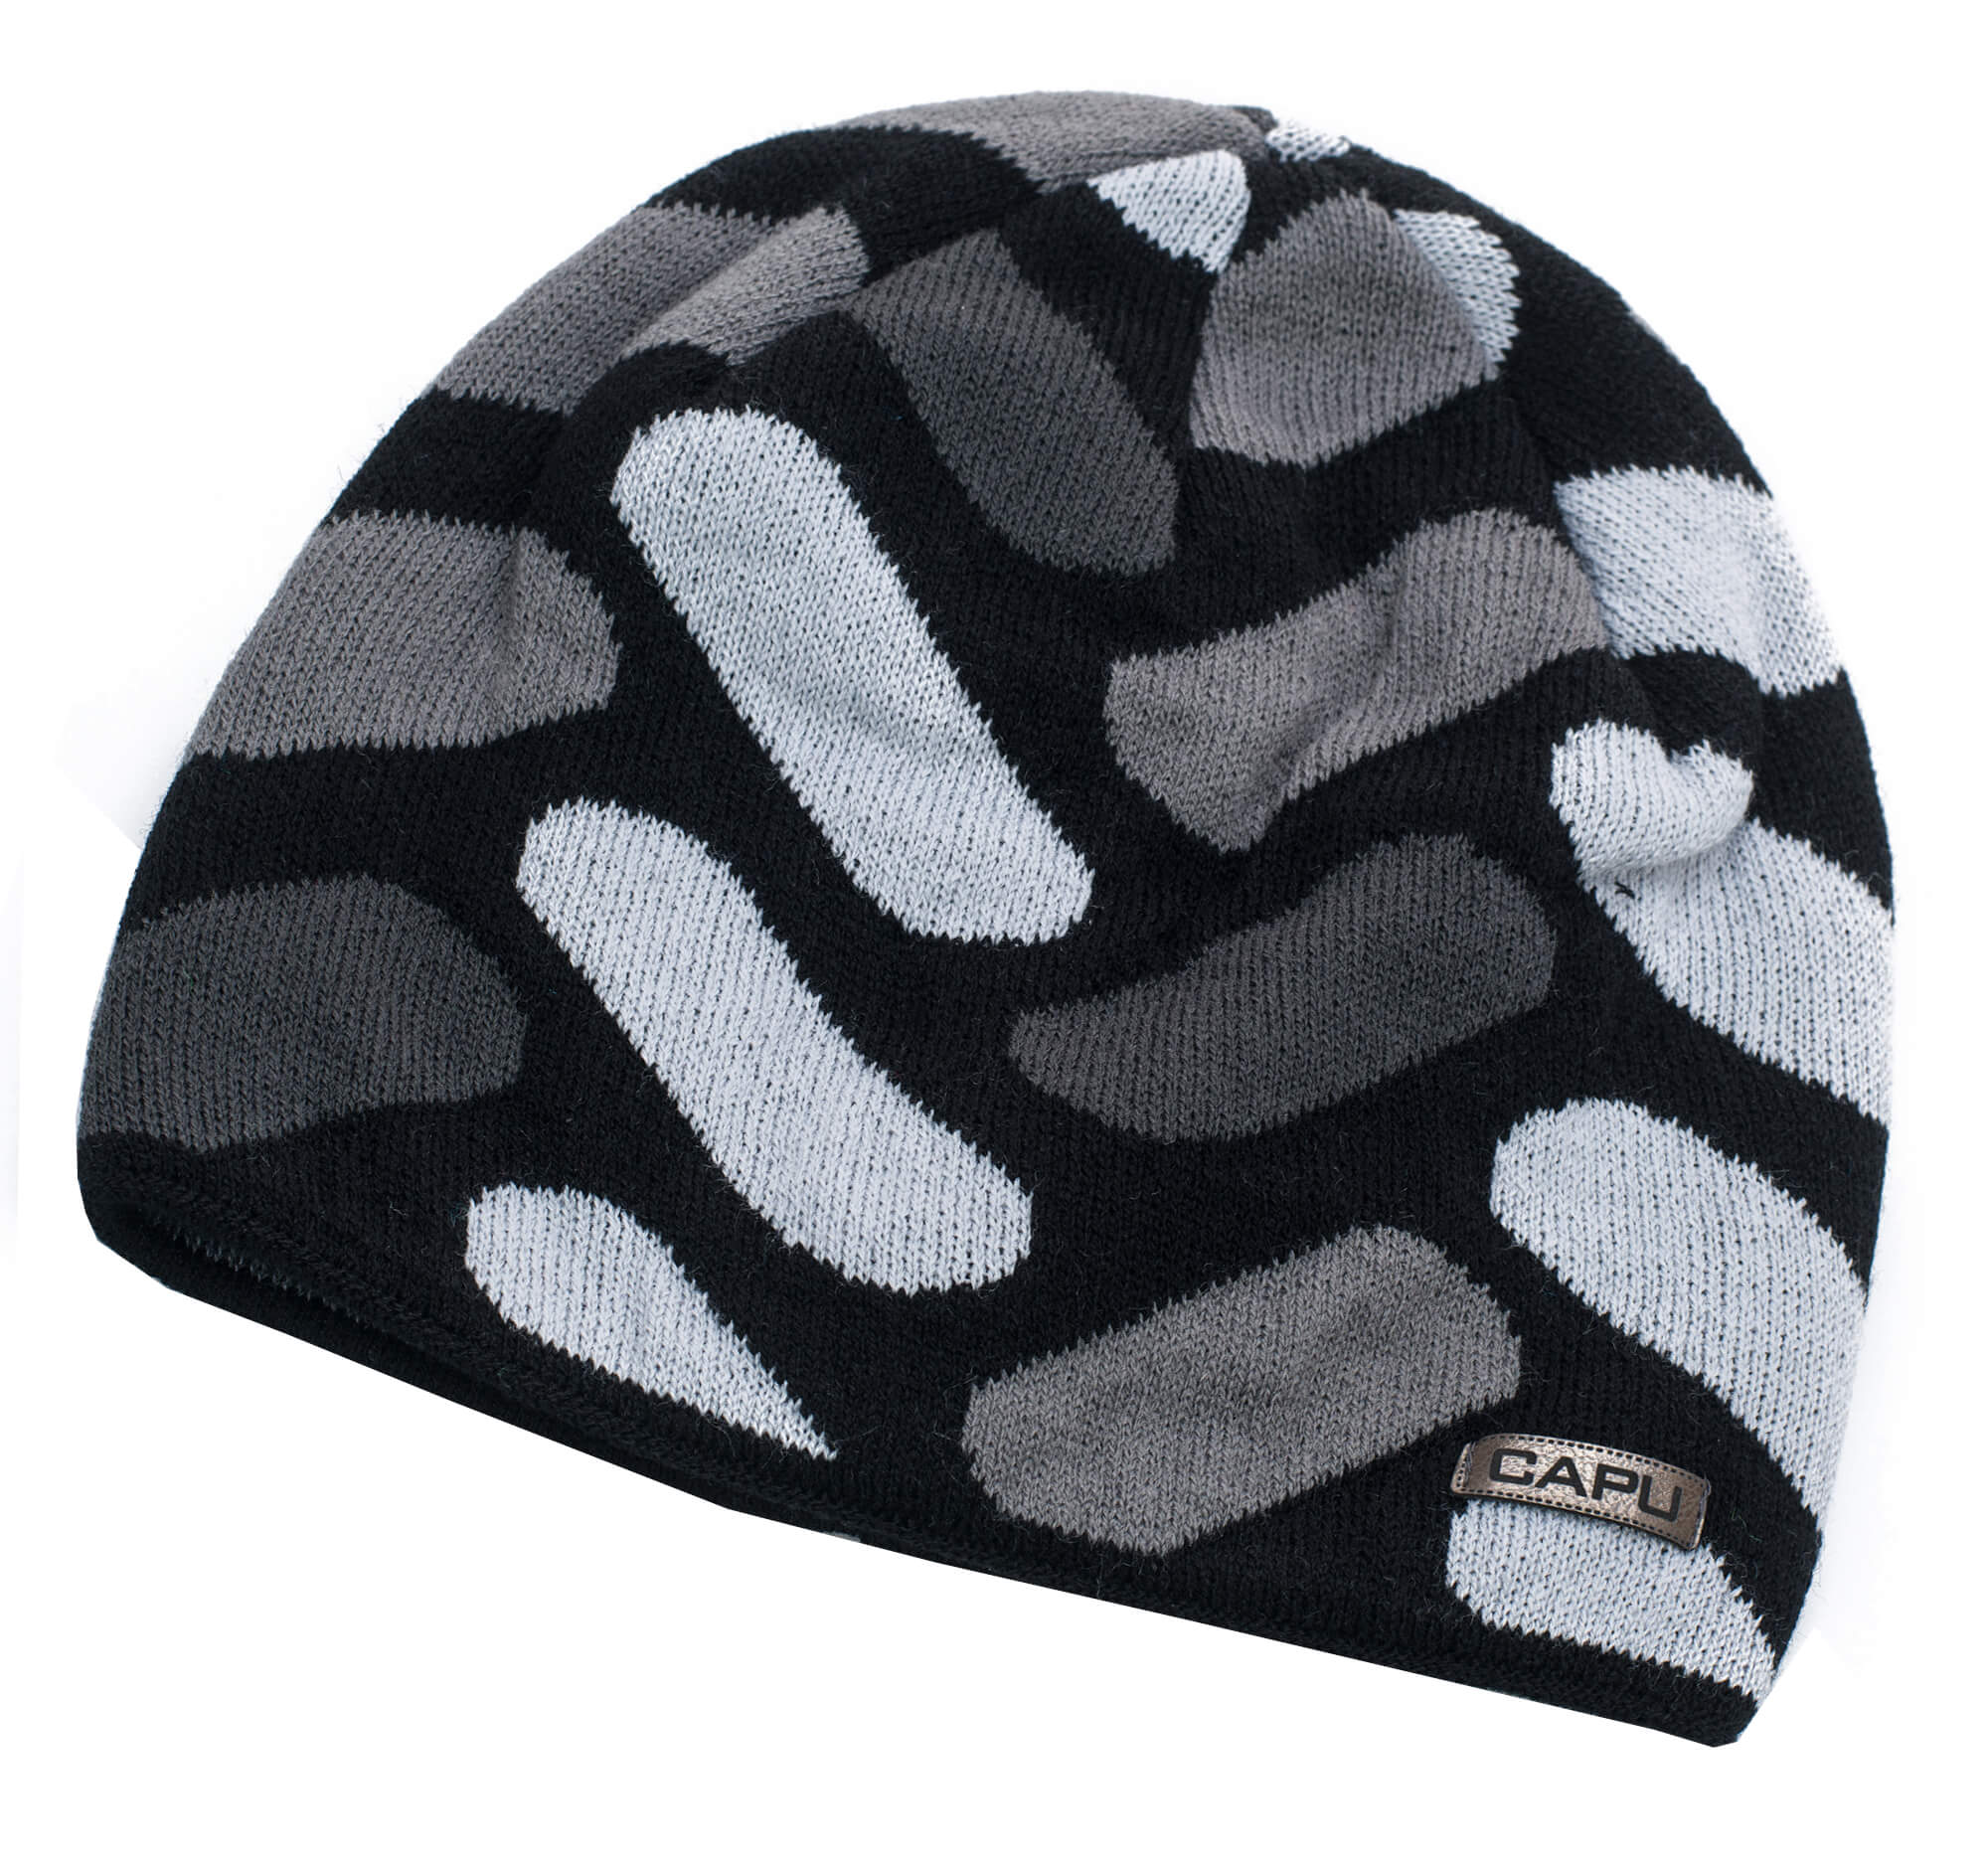 CAPU Téli kalap 1641-D Grey  5c1b685ba7